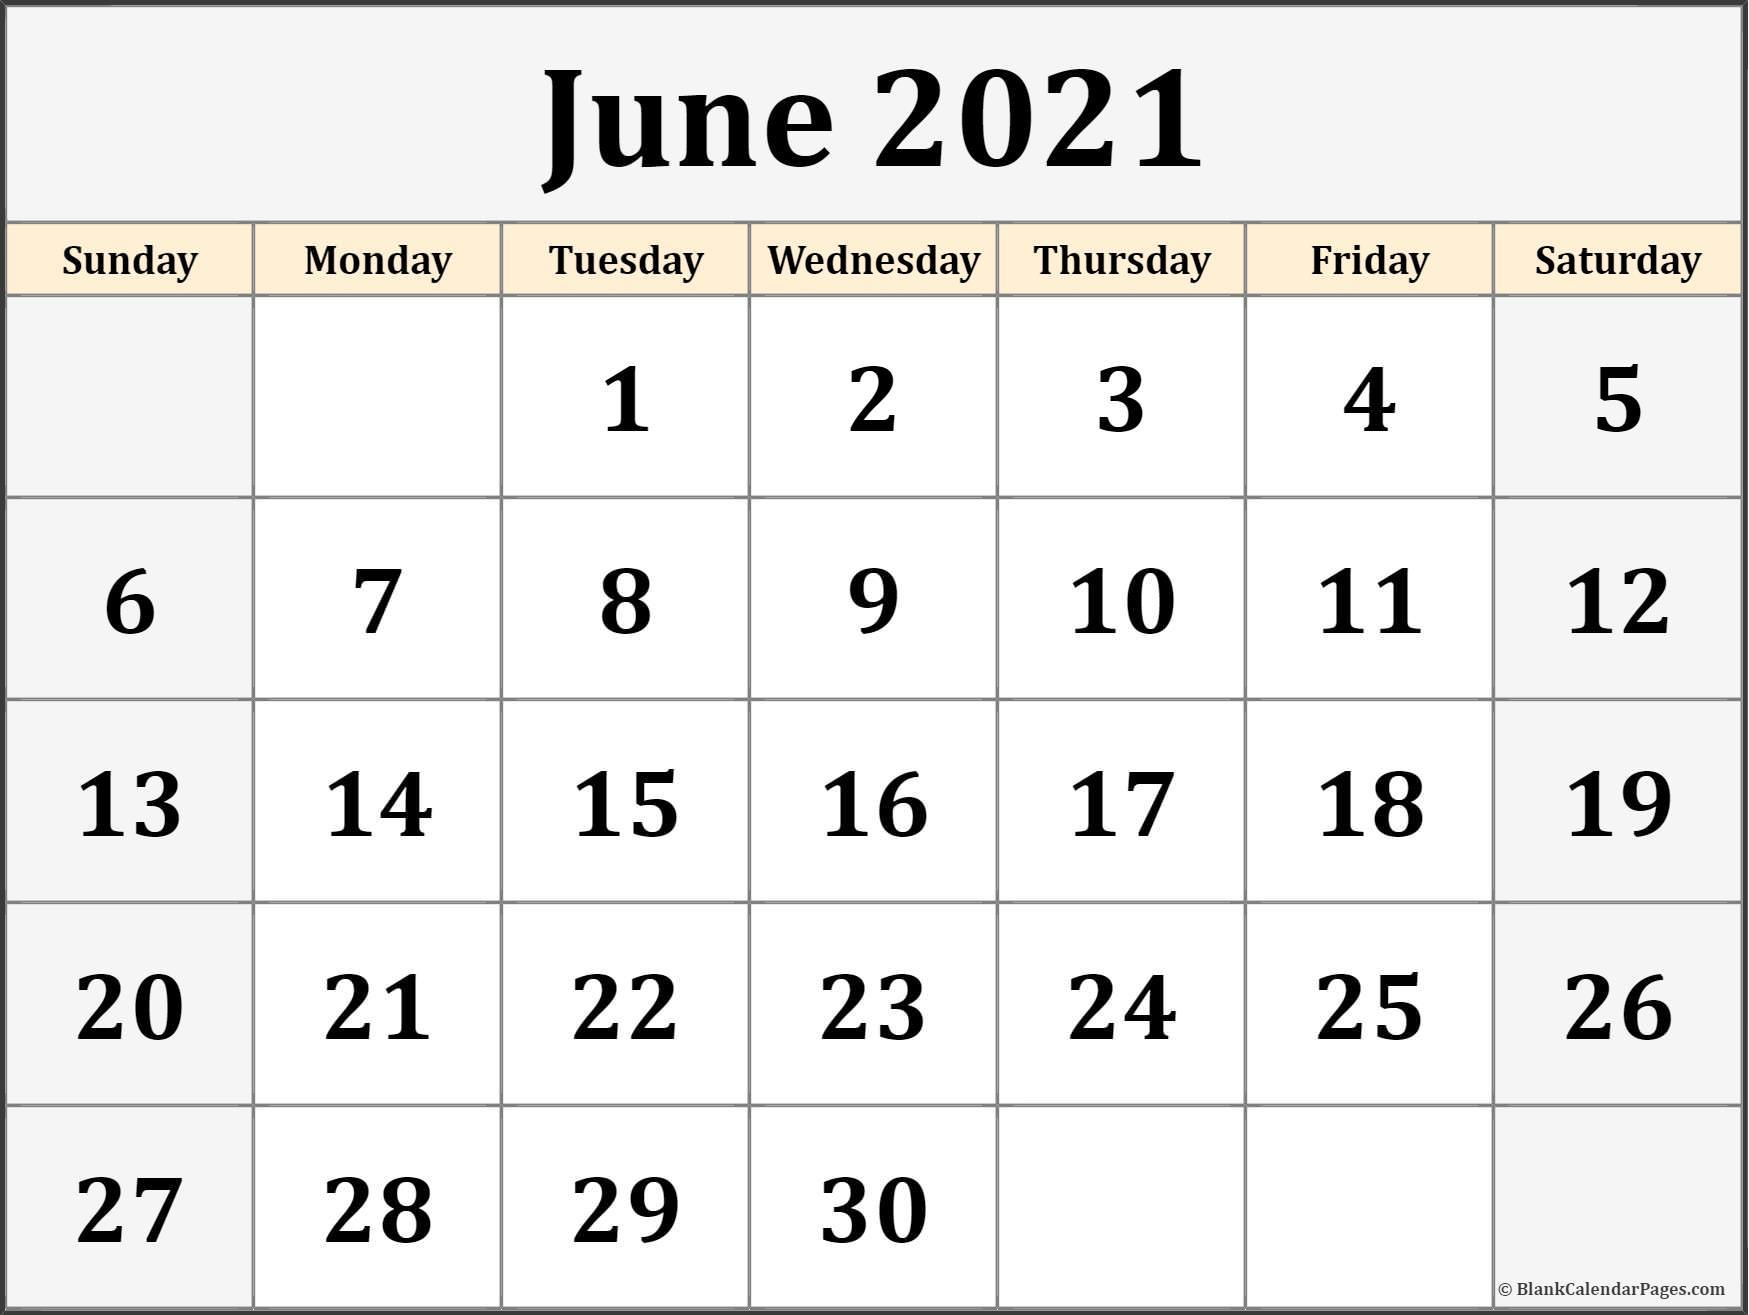 June 2021 Calendar Free Printable Monthly Calendars 3